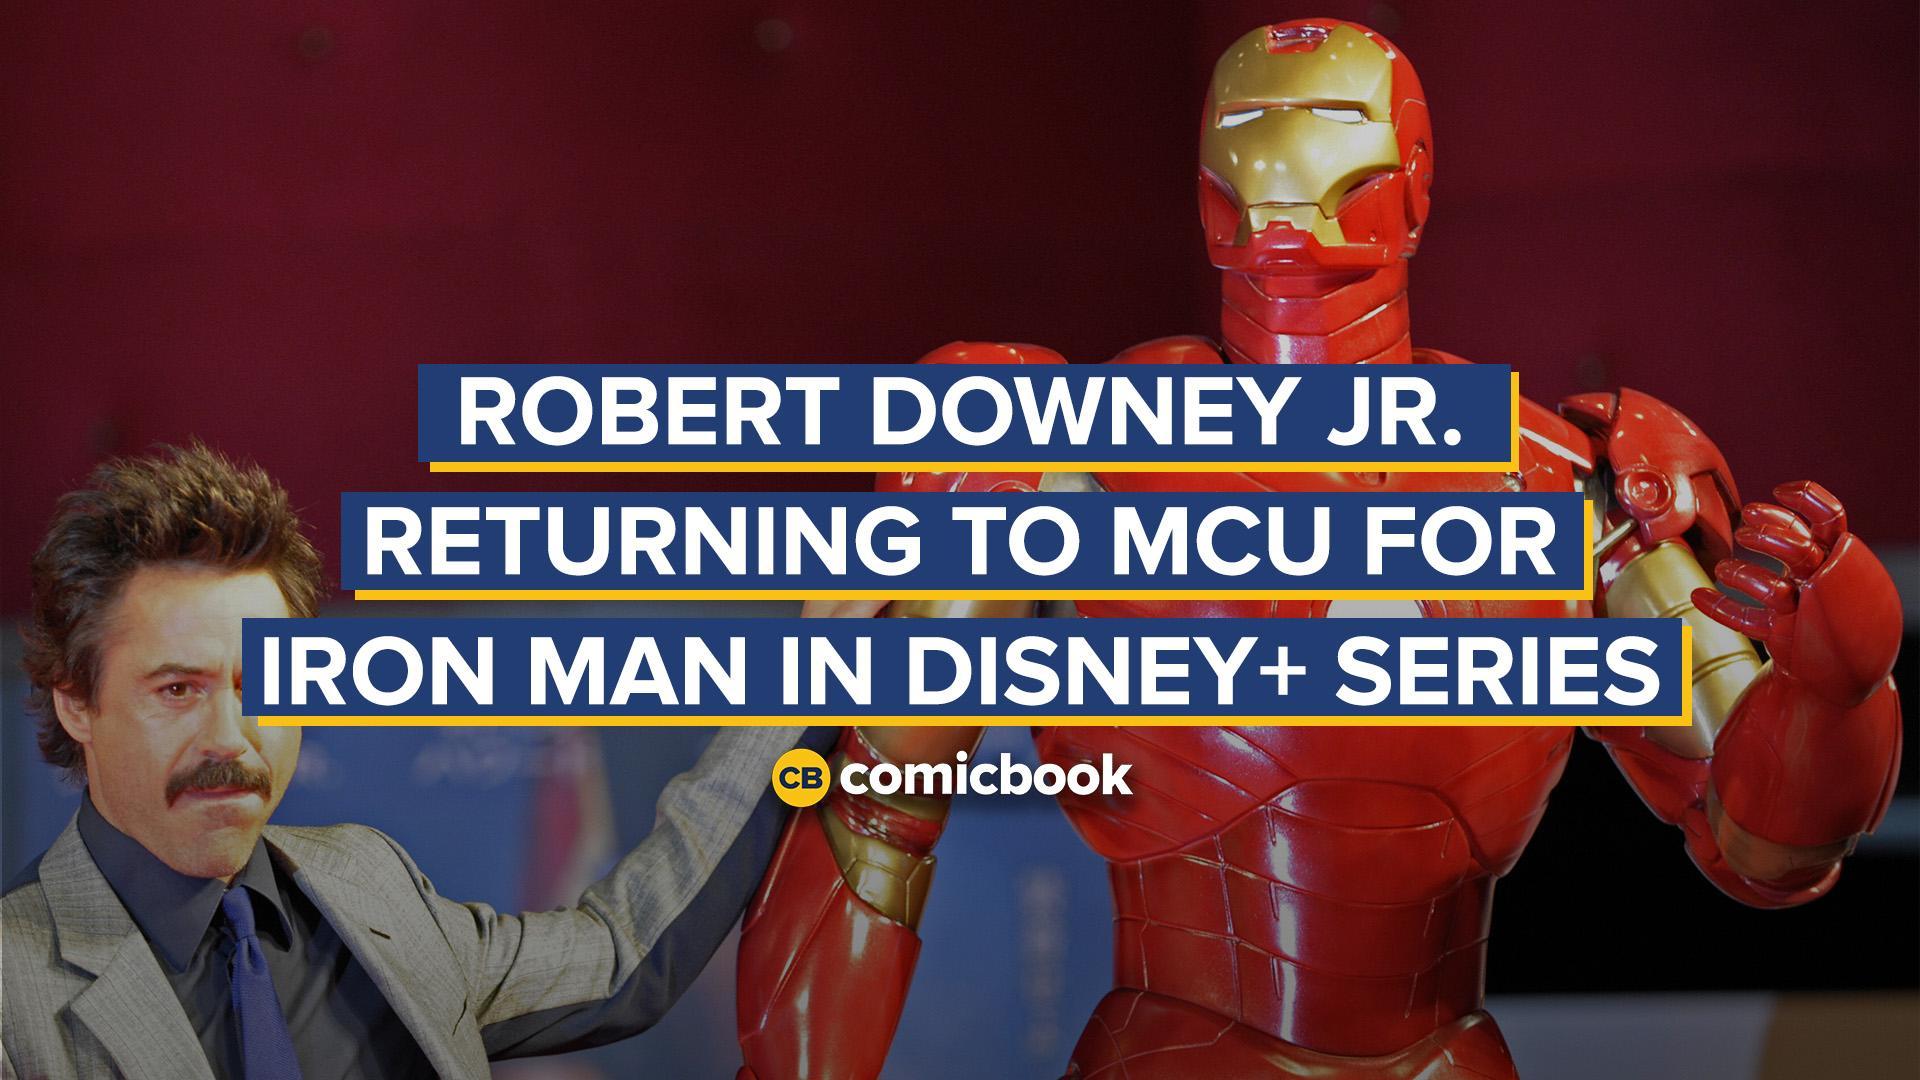 Robert Downey Jr. Returning to MCU for Iron Man in Disney+ Series screen capture